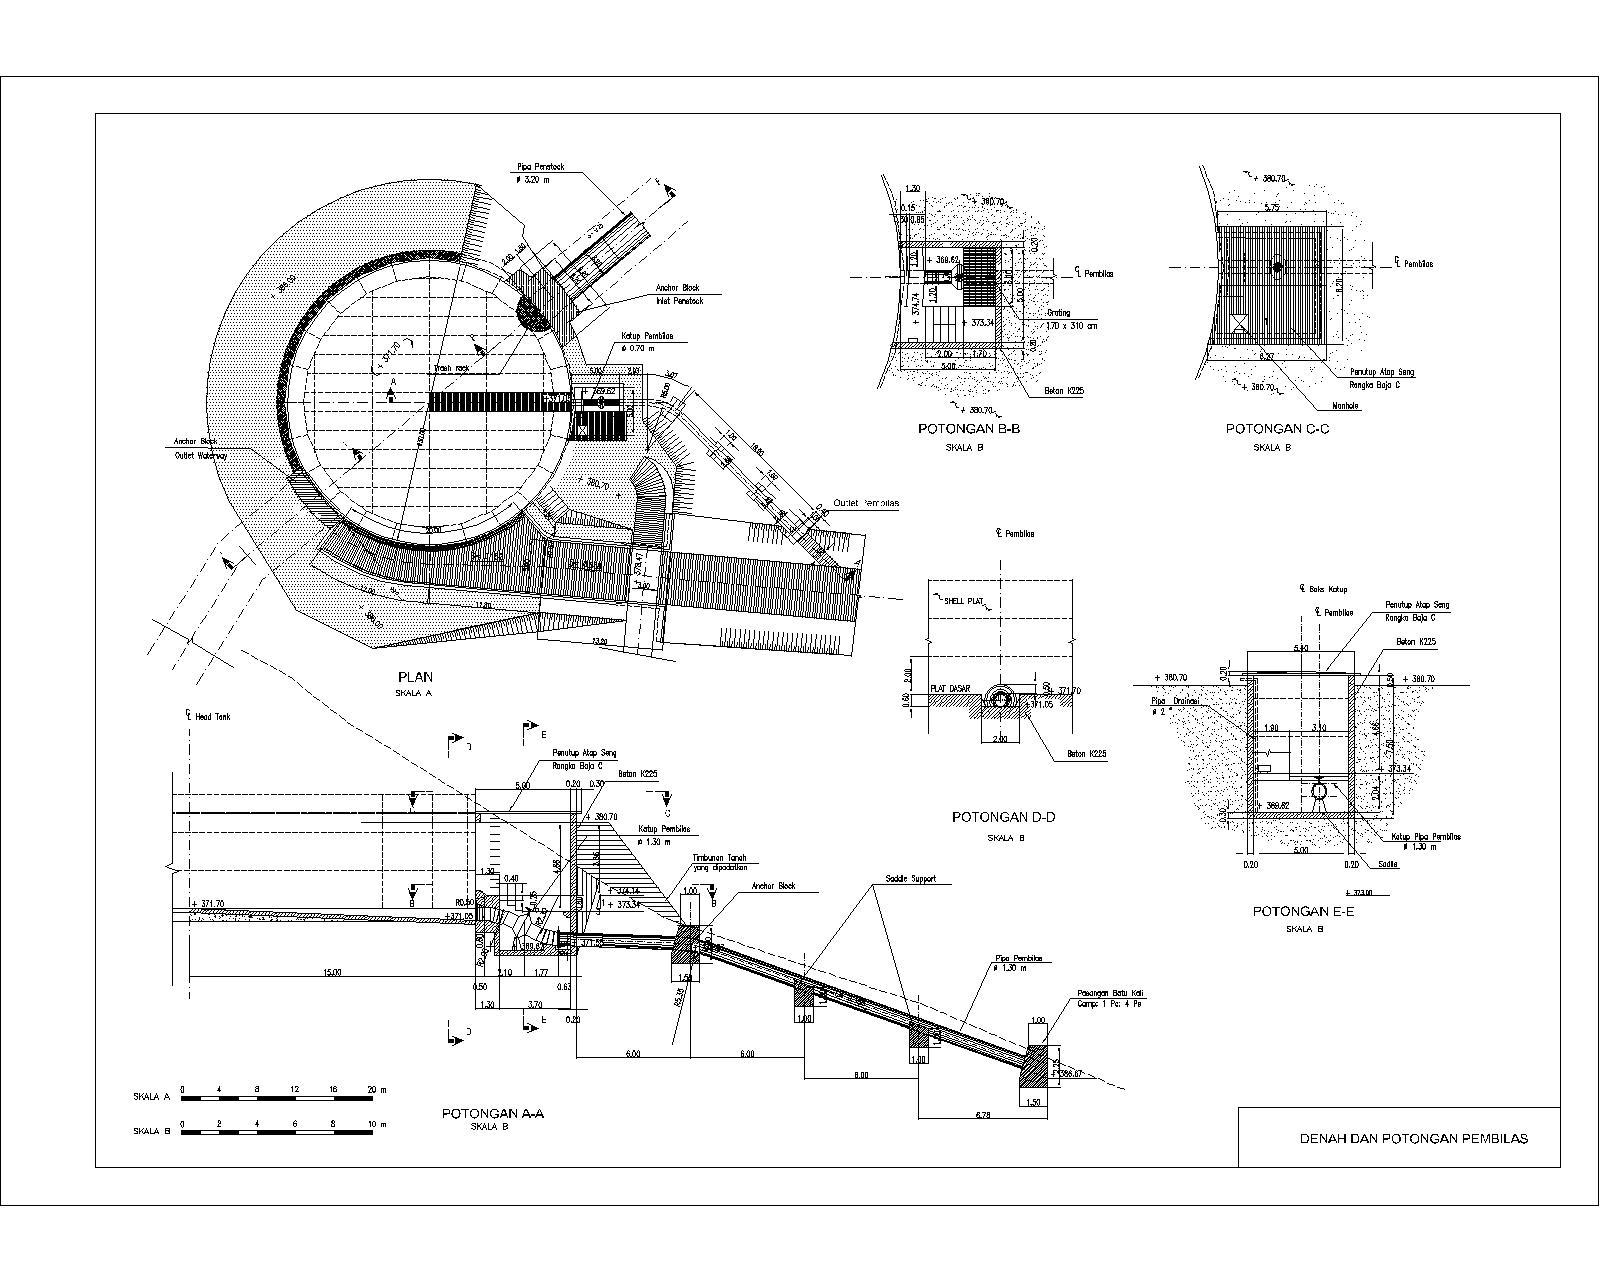 xbox 360 ac adapter wiring diagram